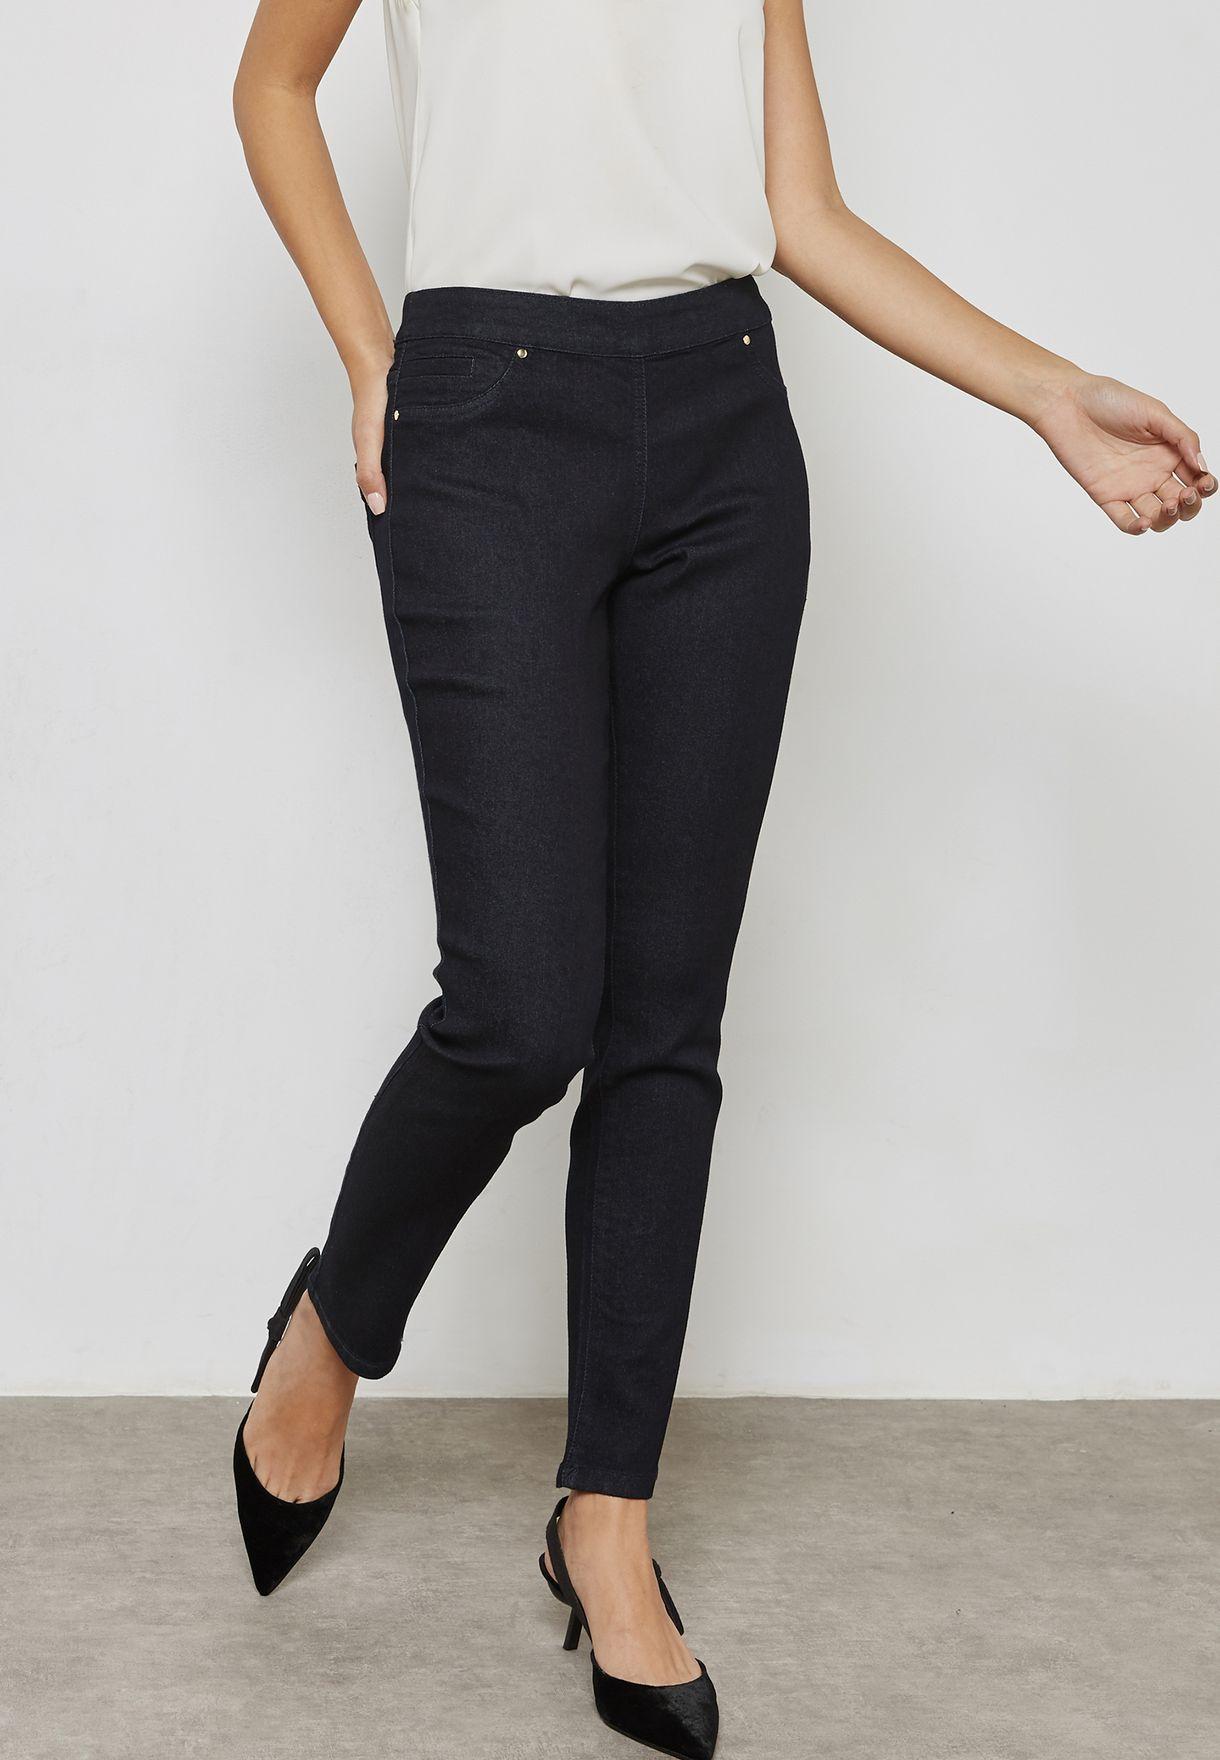 15894259d0e Shop Wallis Petite navy Side Zip Skinny Jeans 090077133 for Women in Qatar  - WA008AT51YIA